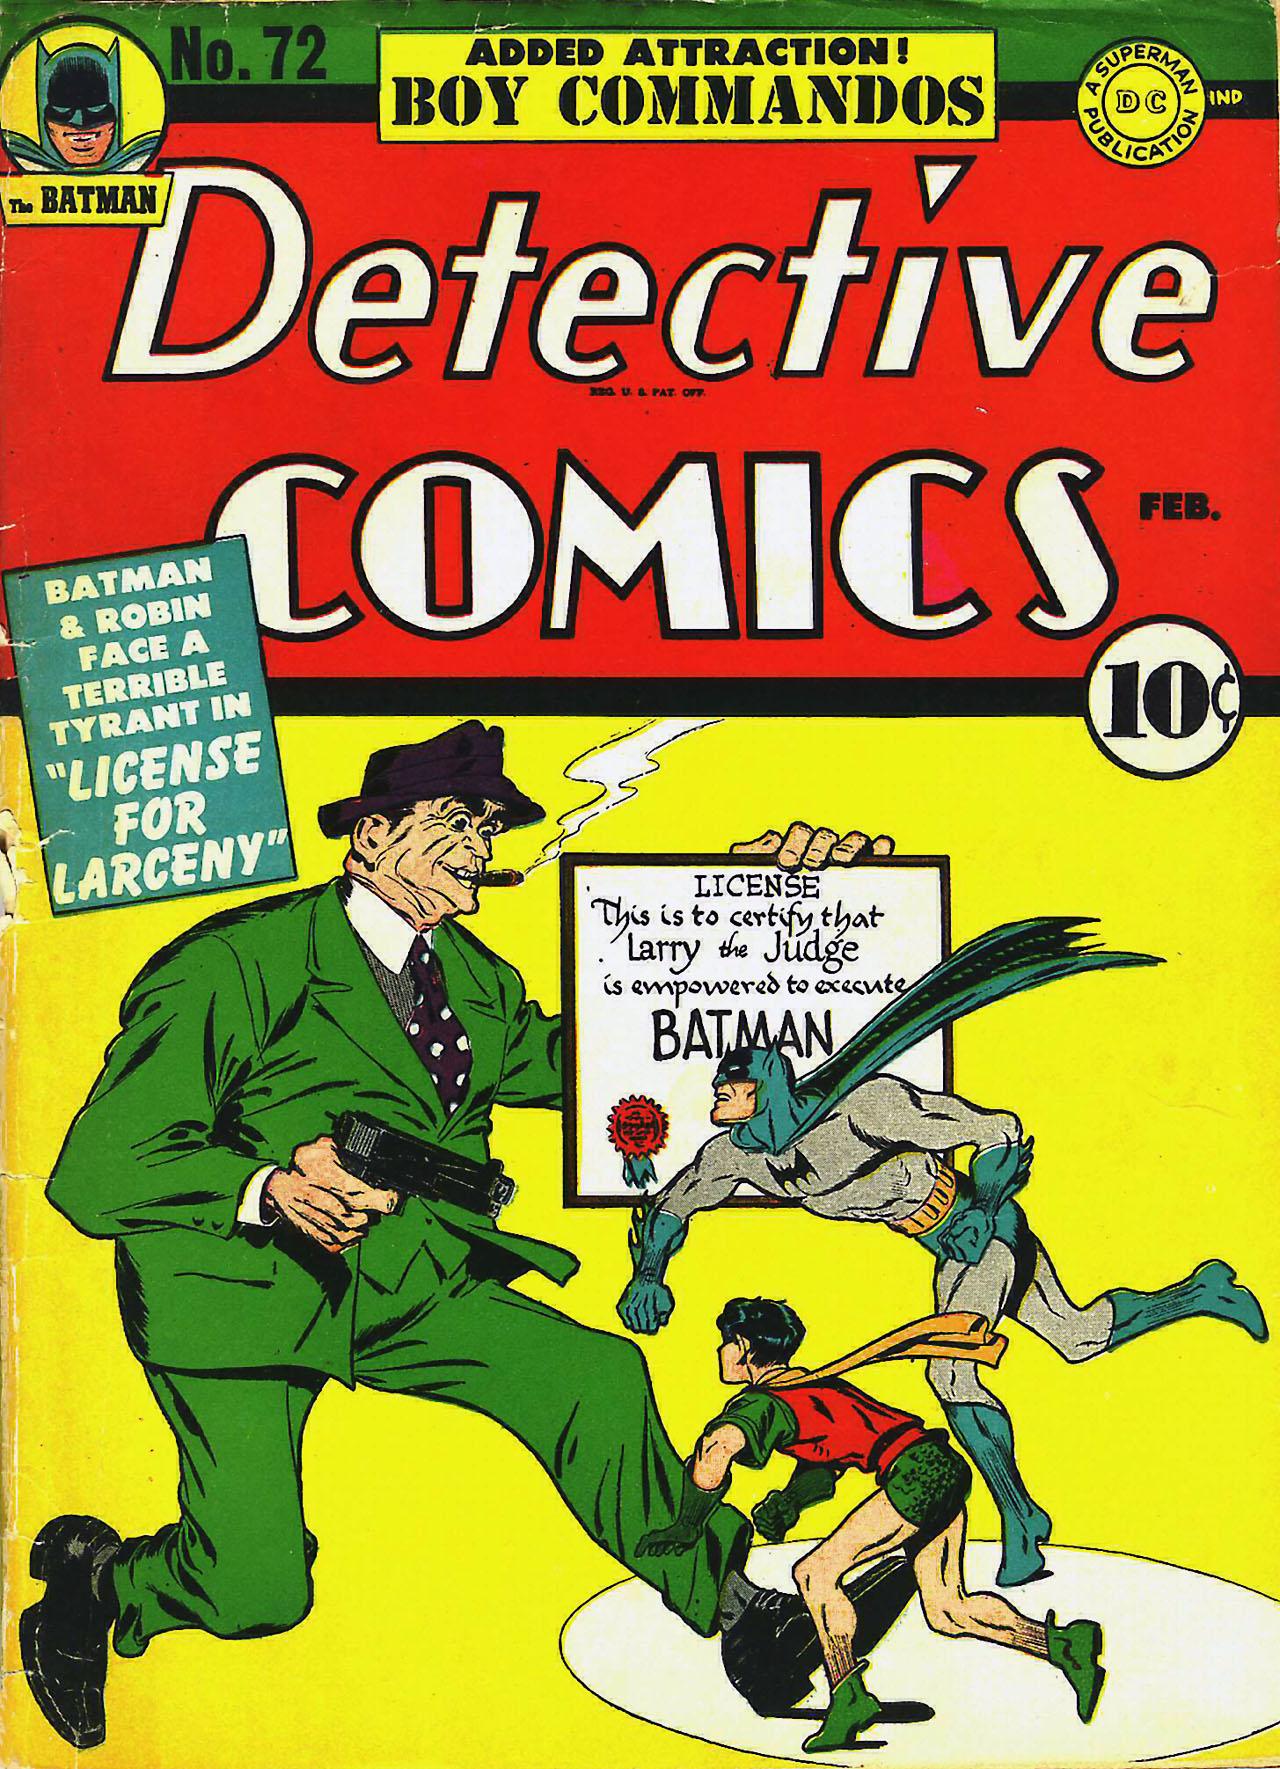 Read online Detective Comics (1937) comic -  Issue #72 - 2